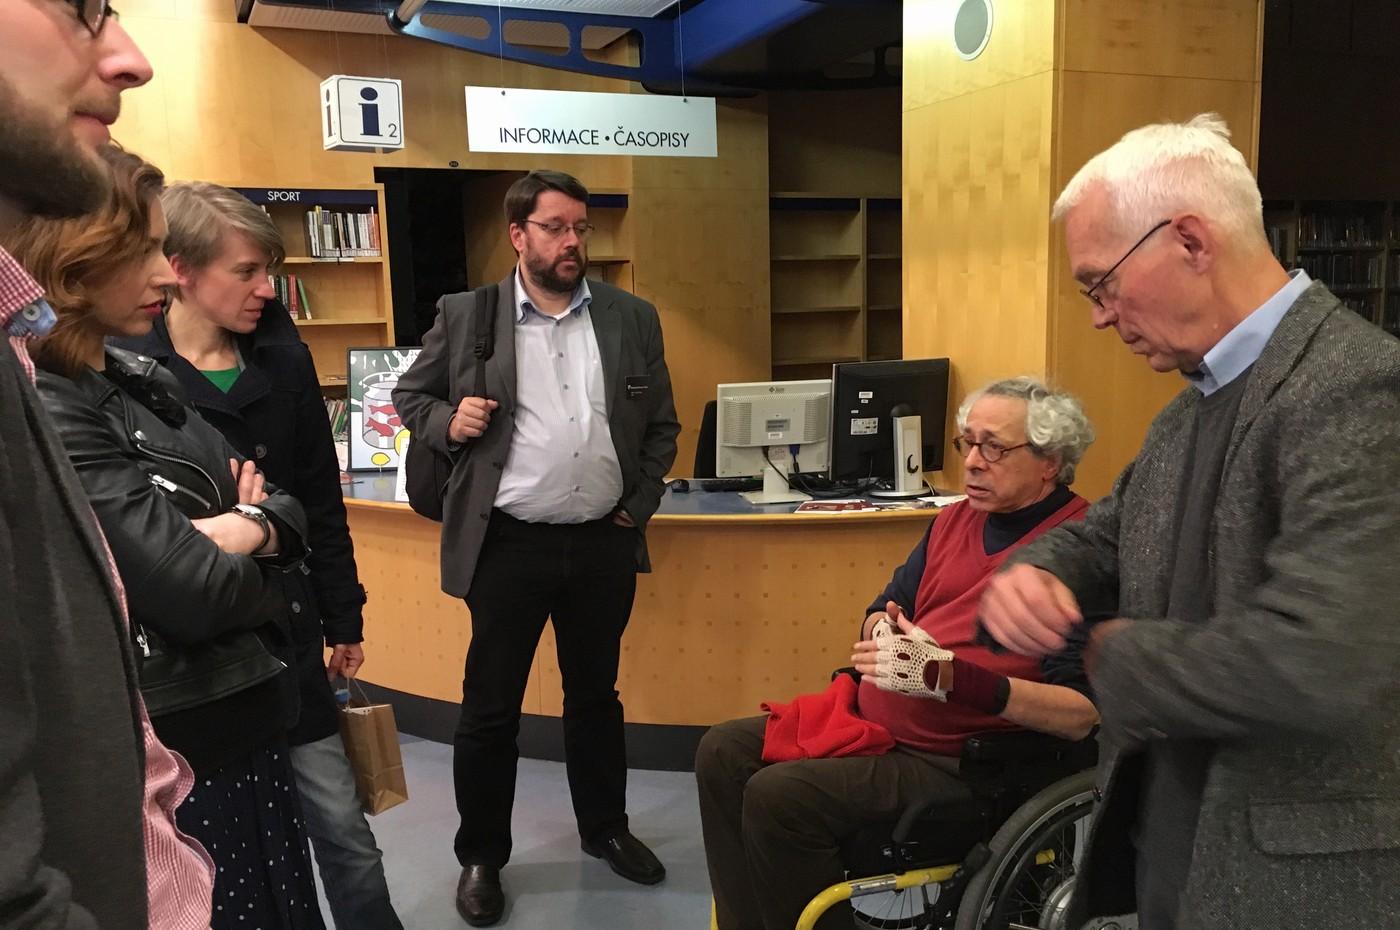 Diskuse s ředitelem NTK Martinem Svobodou